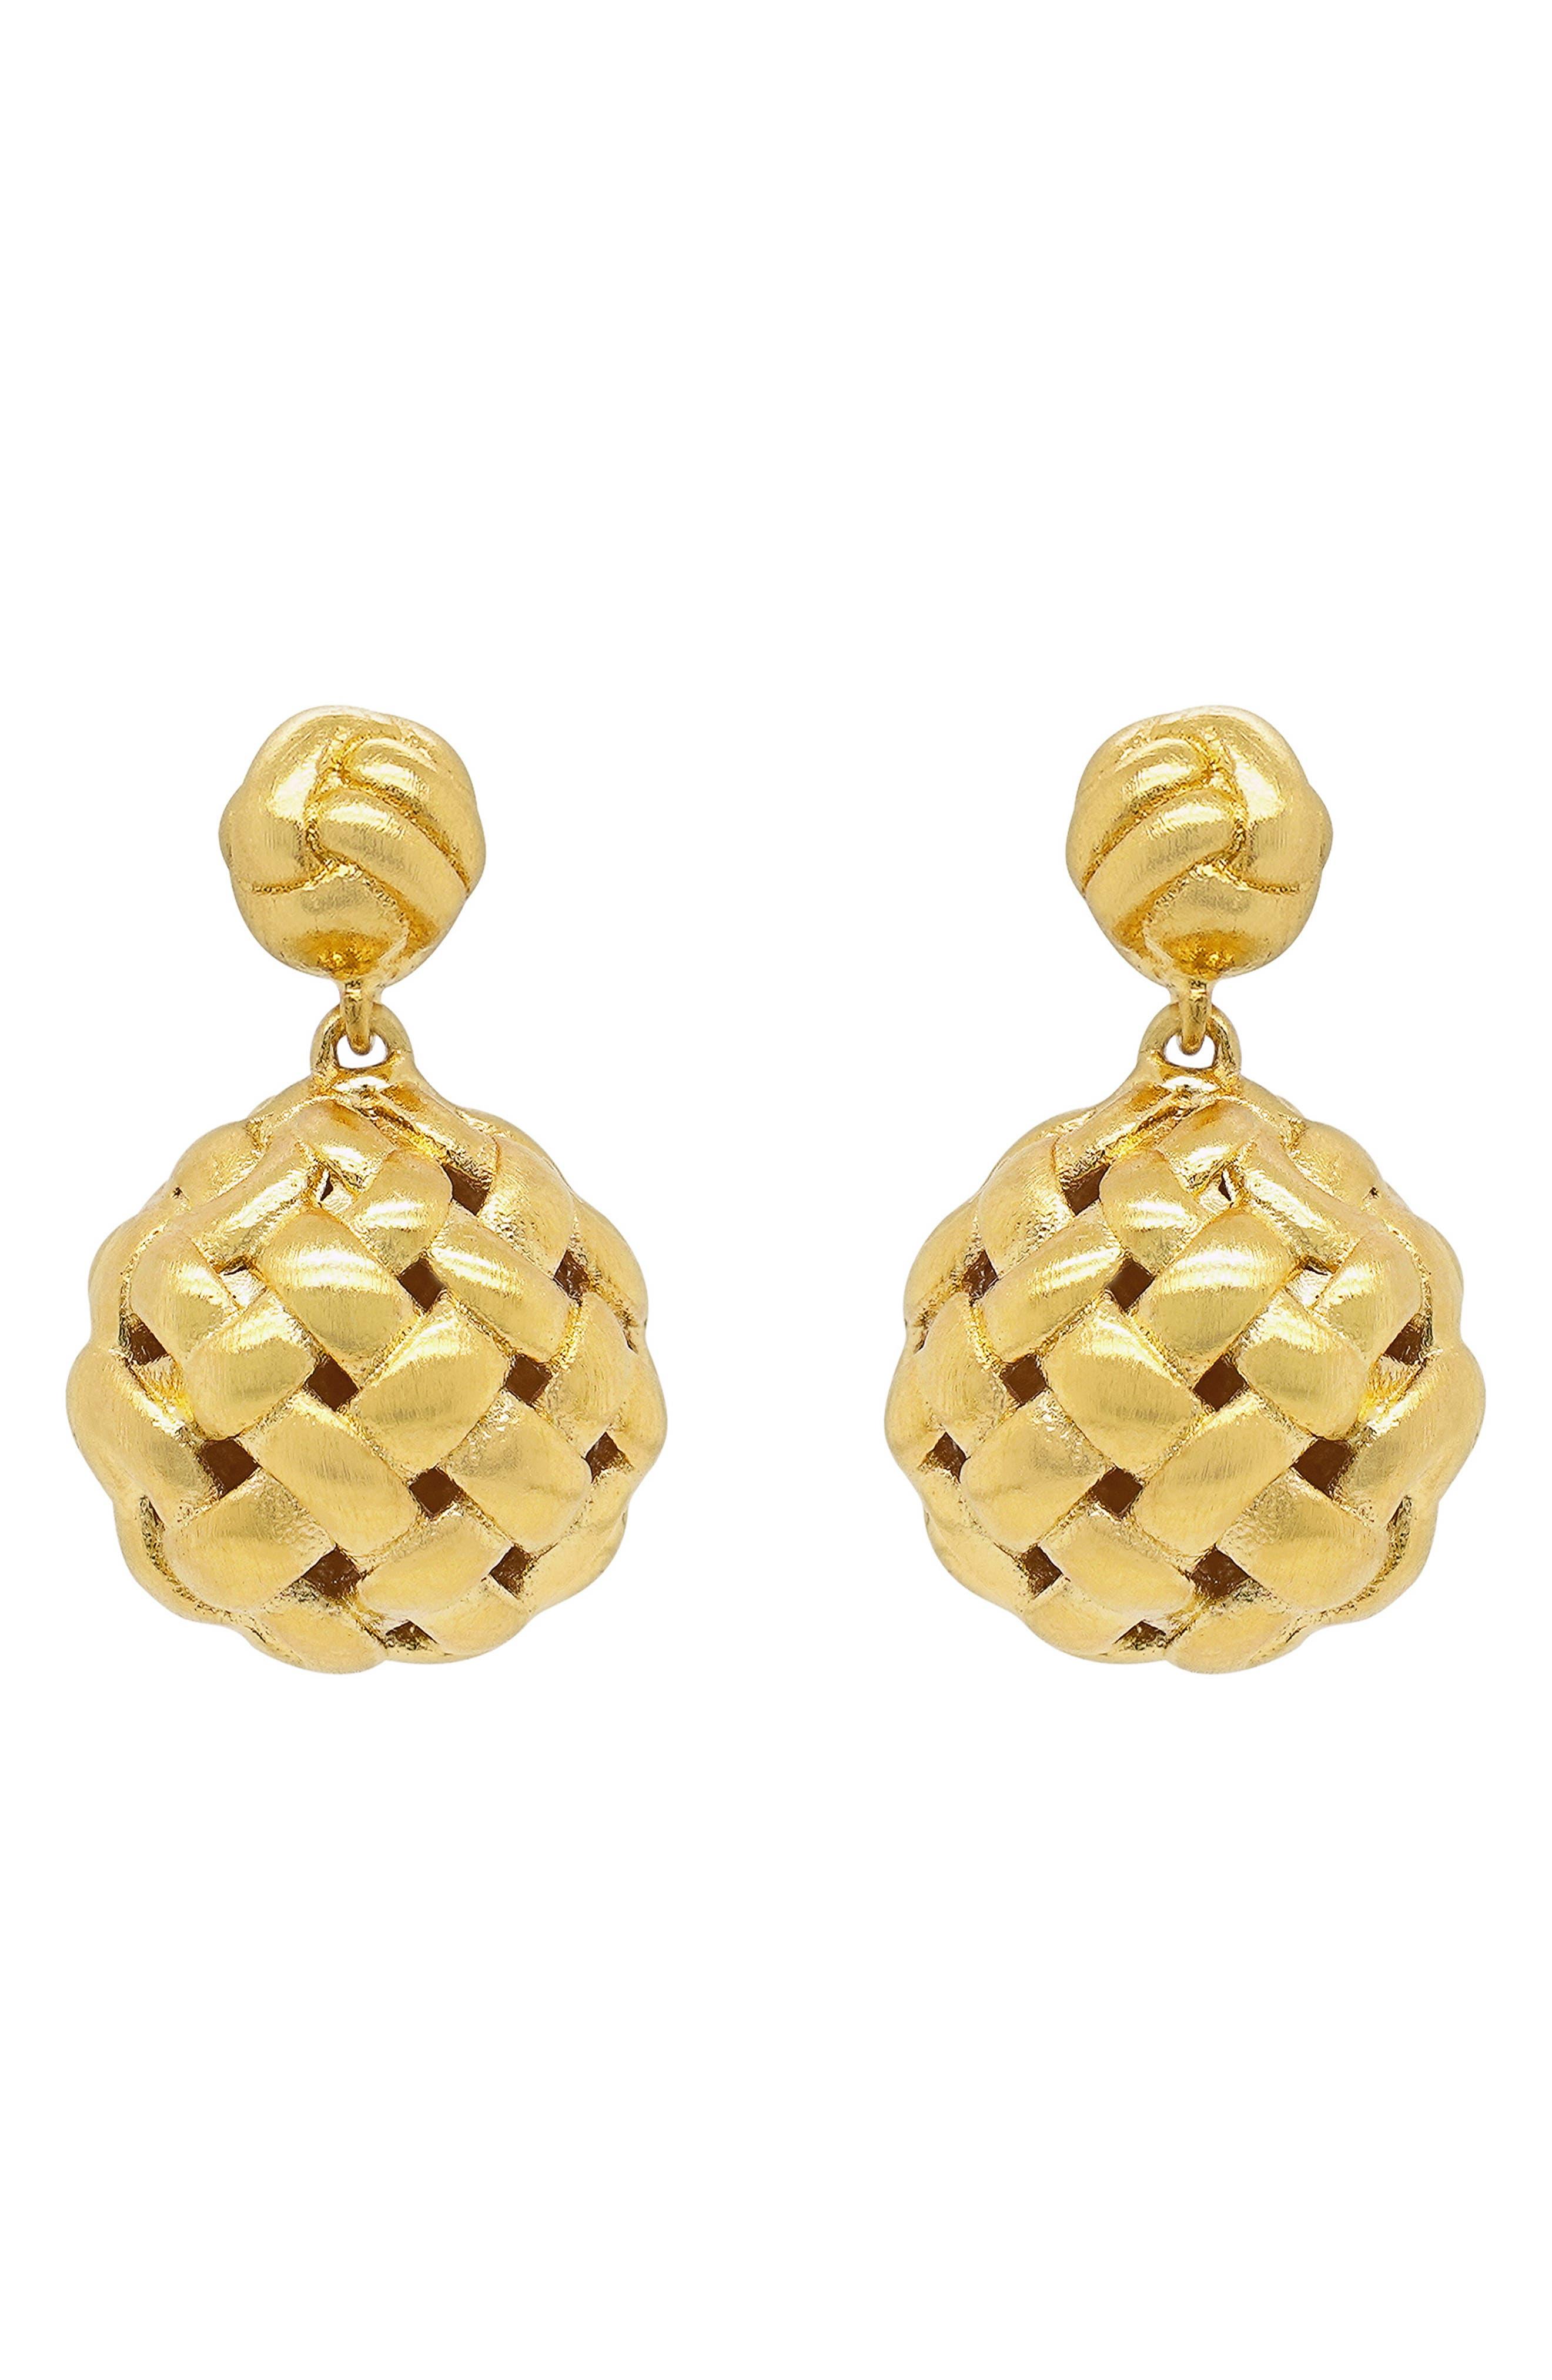 Weave Droplet Earrings